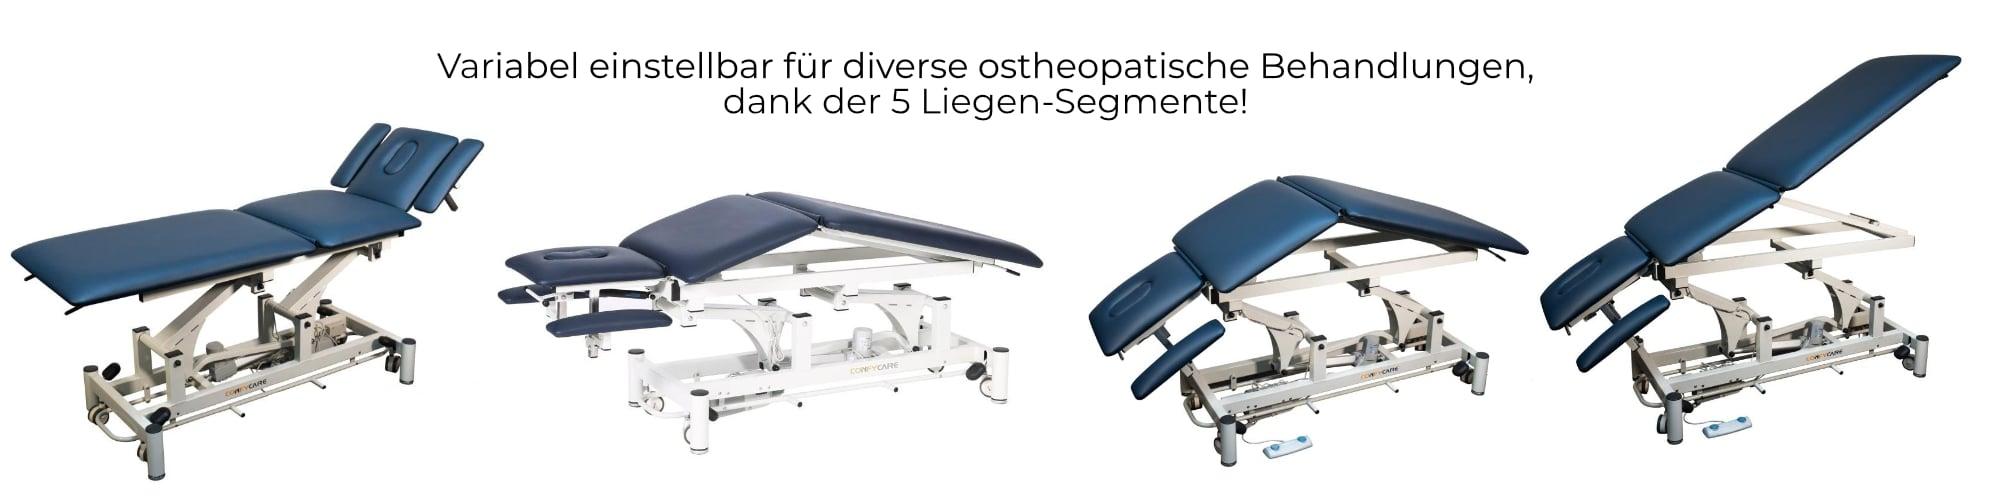 Ostheopatie-Blog_Bild3